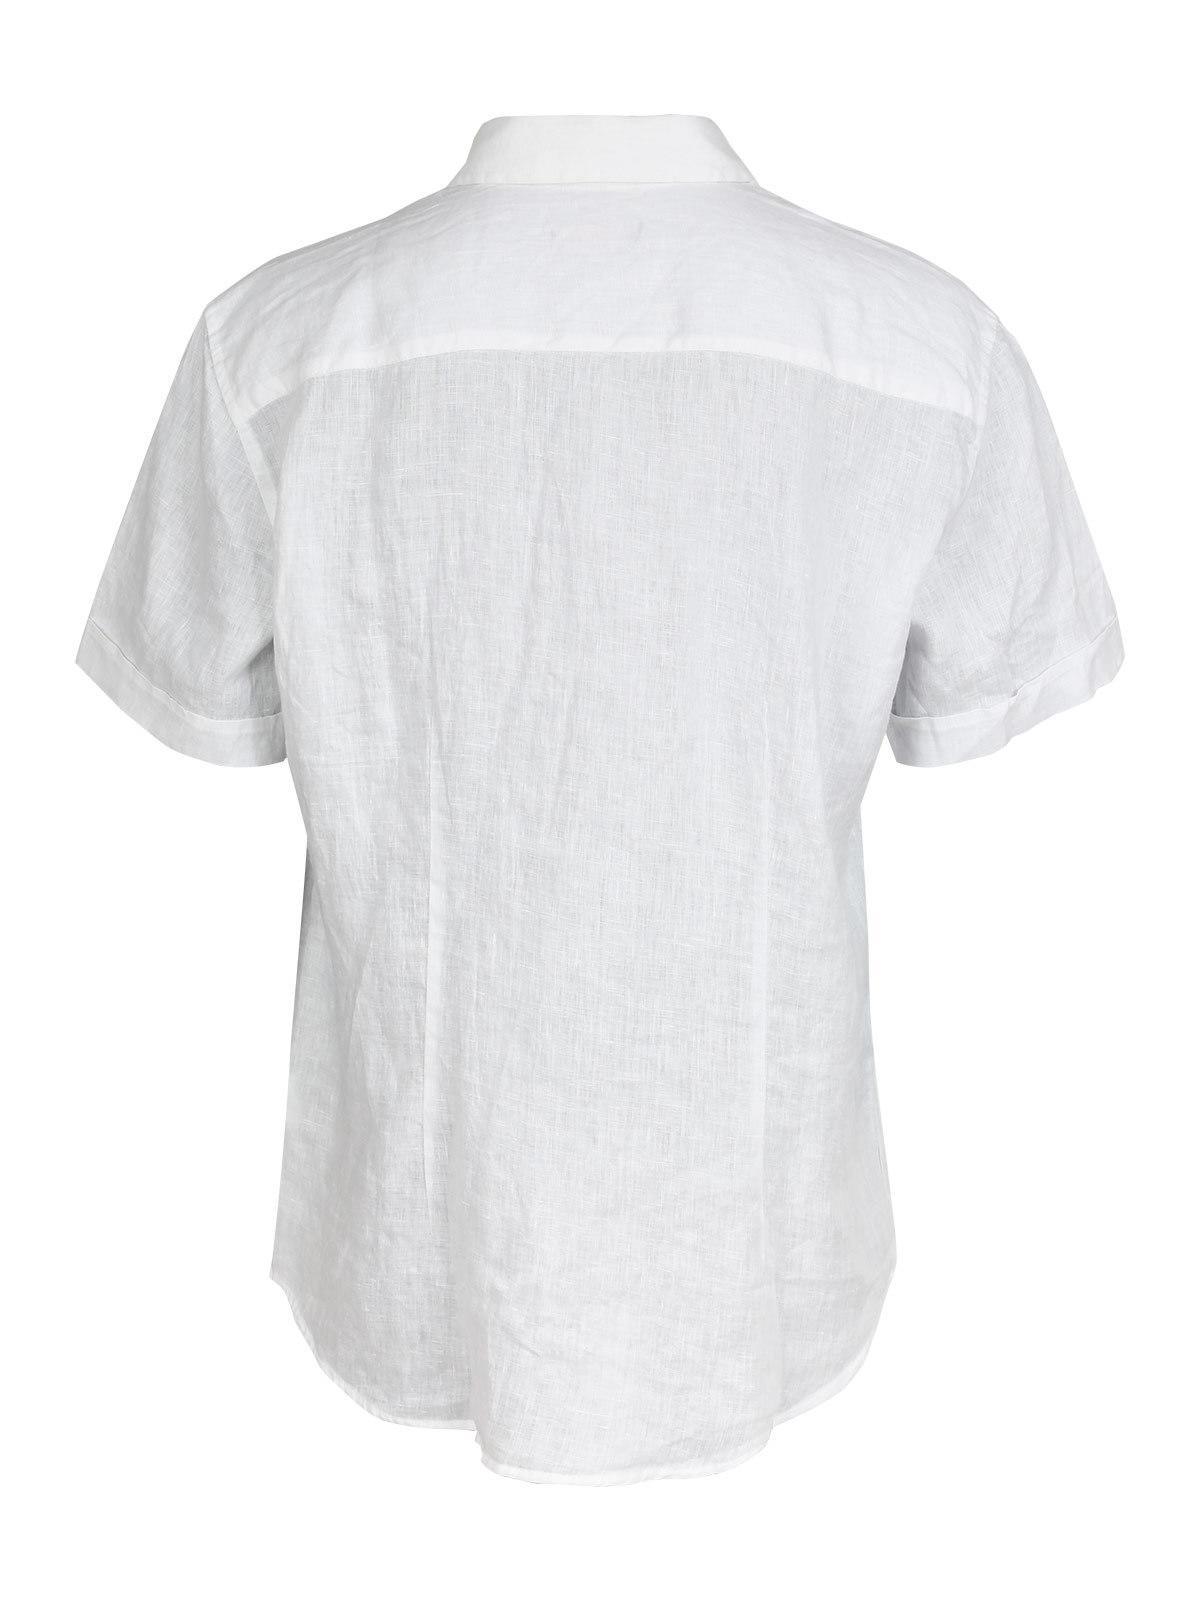 1266c60c00 Camicia di lino a maniche corte - bianco guy | MecShopping